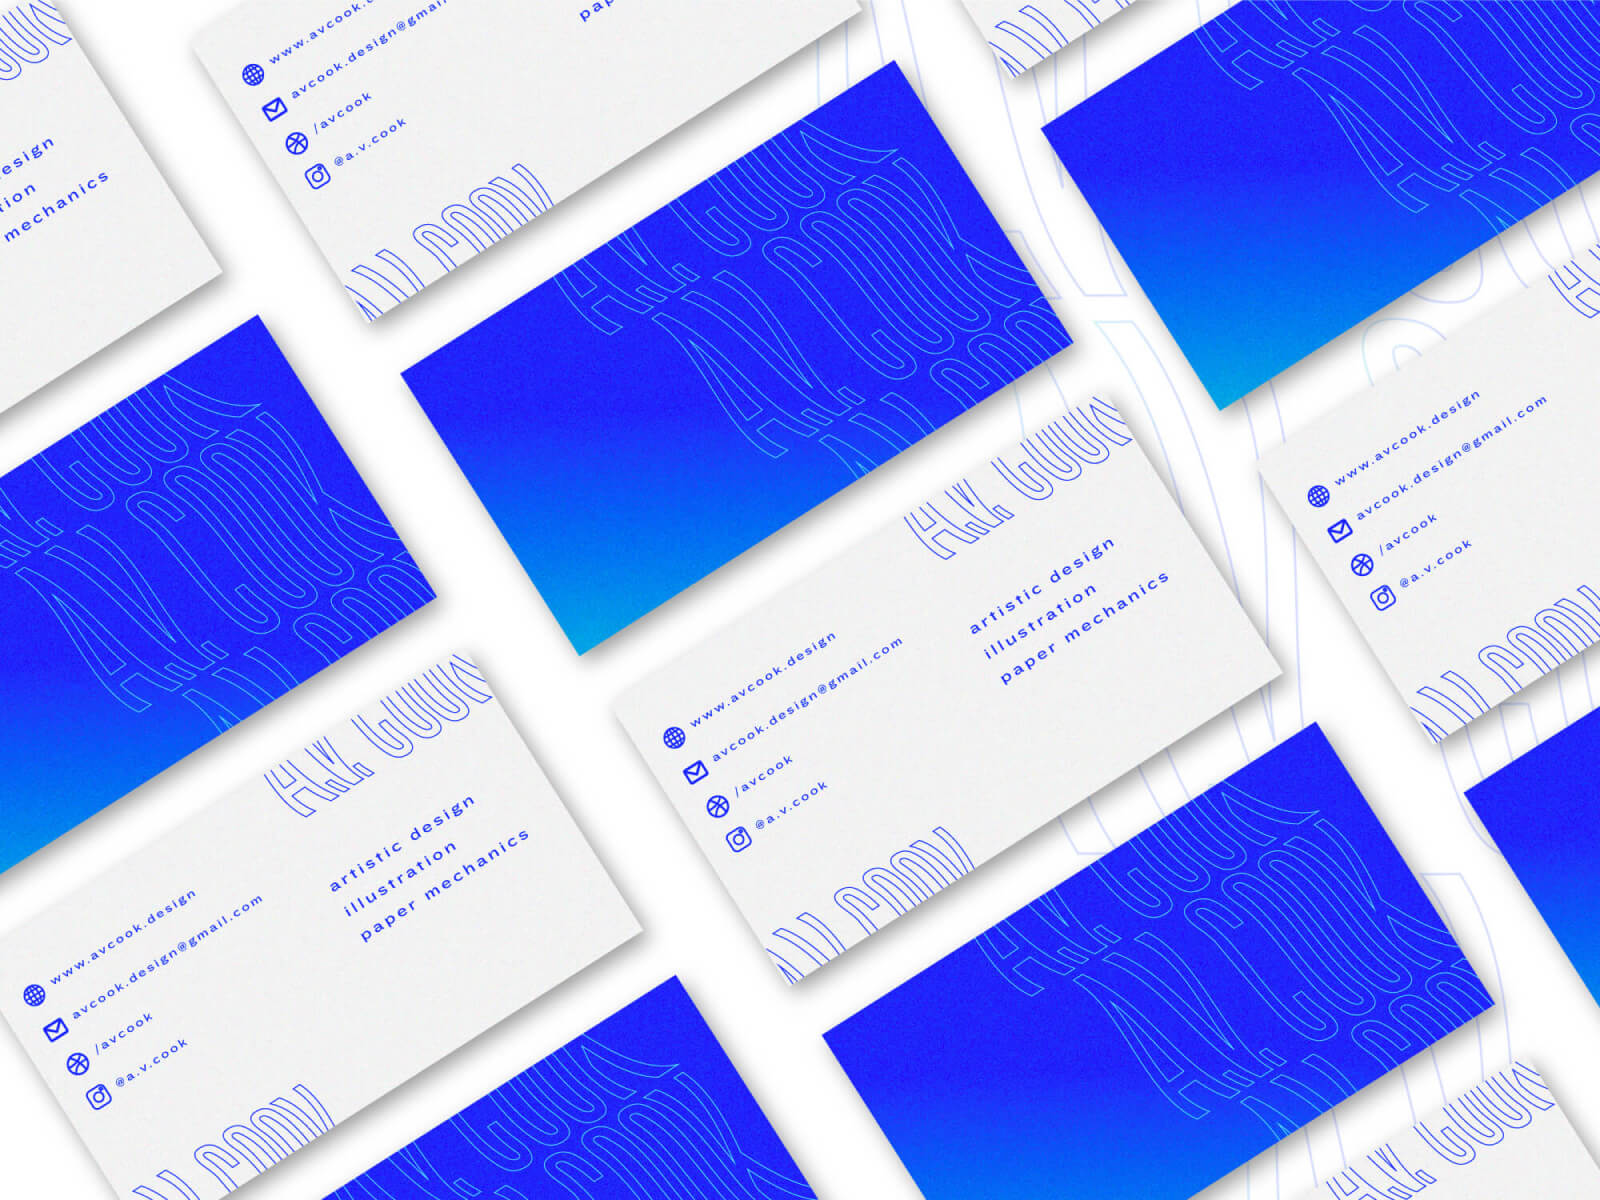 Business cards for A.V. Cook, a designer and illustrator. (See work)